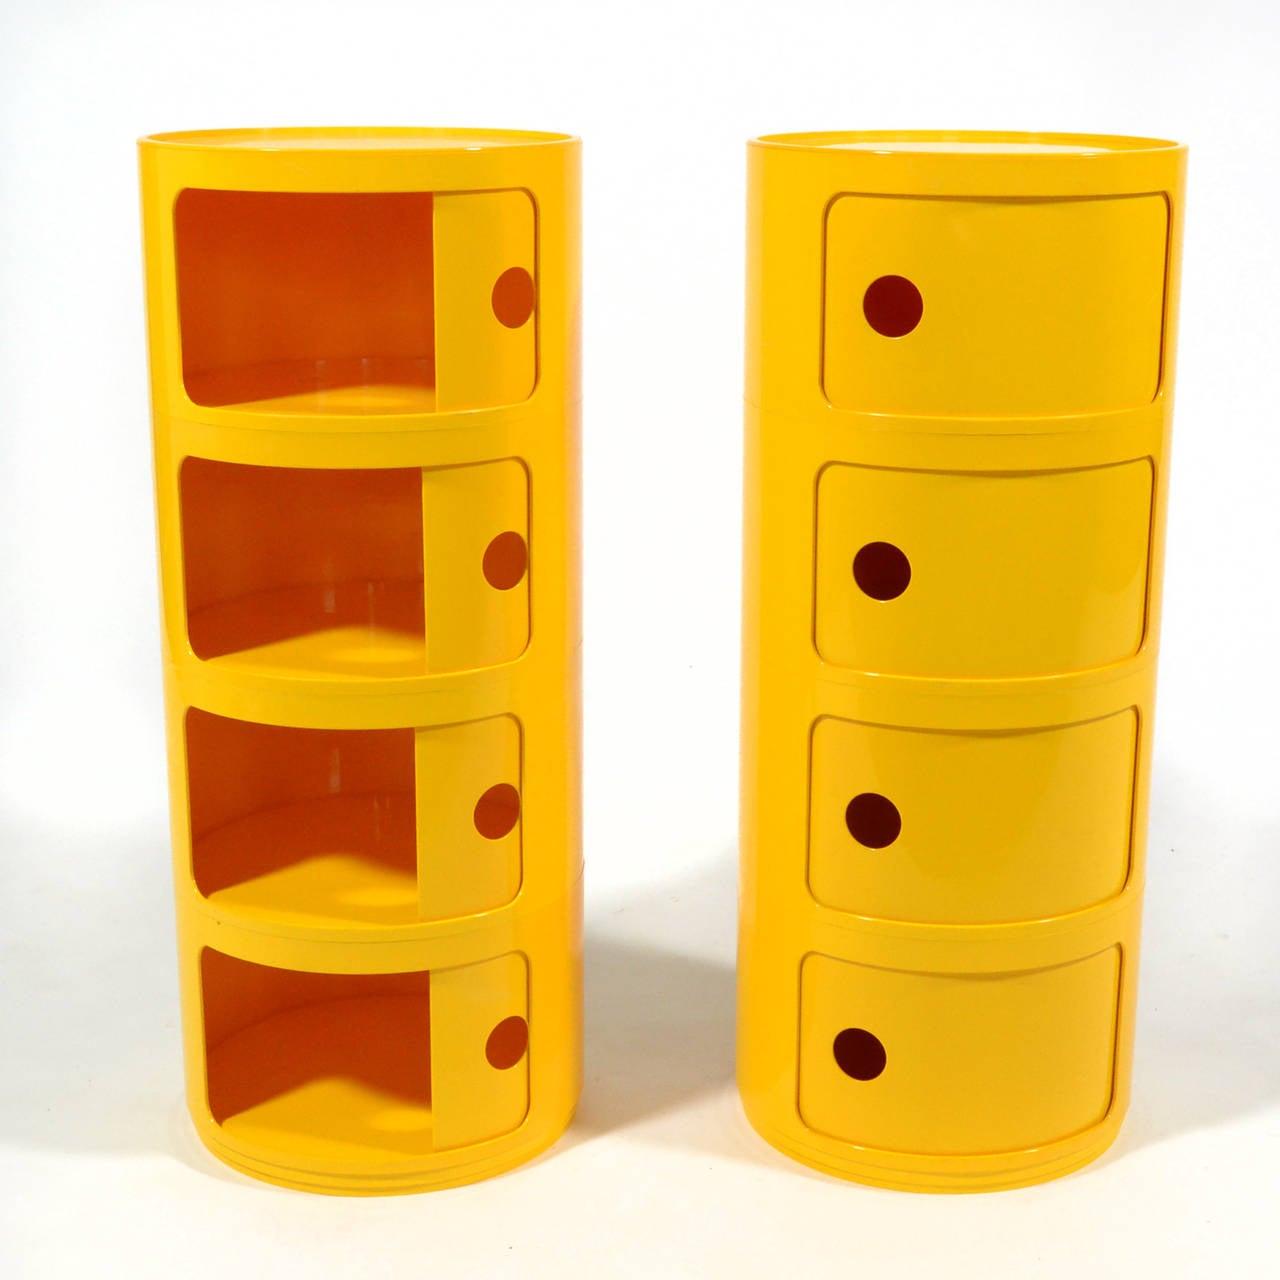 anna castelli ferrieri set of componibili storage units by. Black Bedroom Furniture Sets. Home Design Ideas